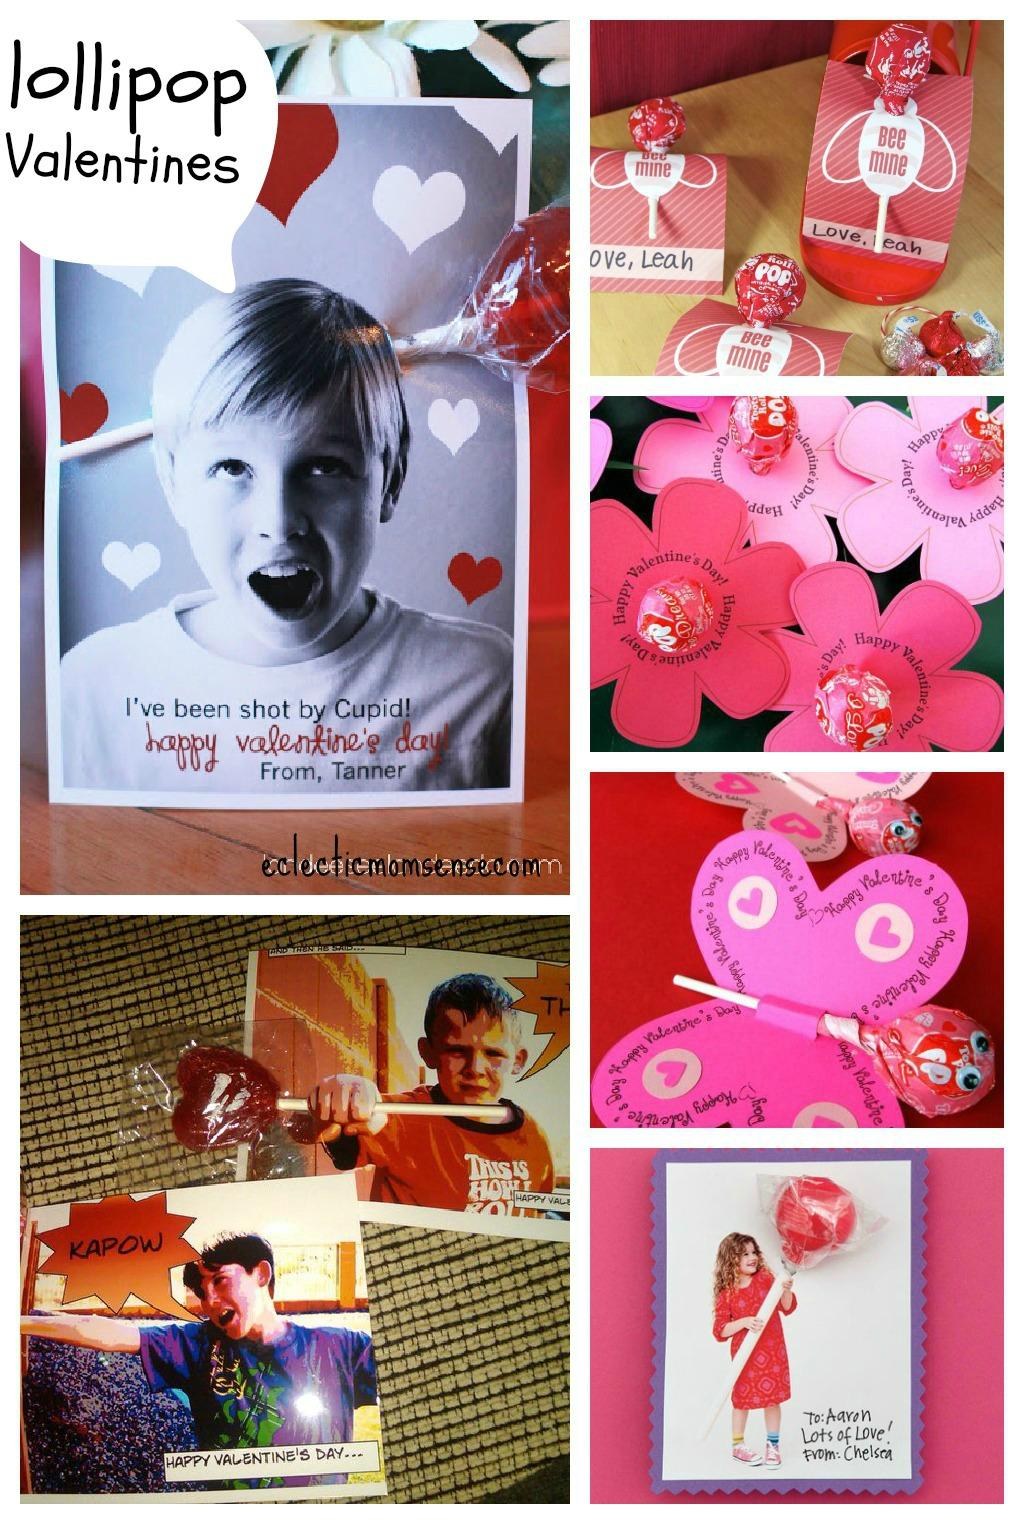 Lollipop Valentines Ideas via @eclecticmommy - eclecticmomsense.com